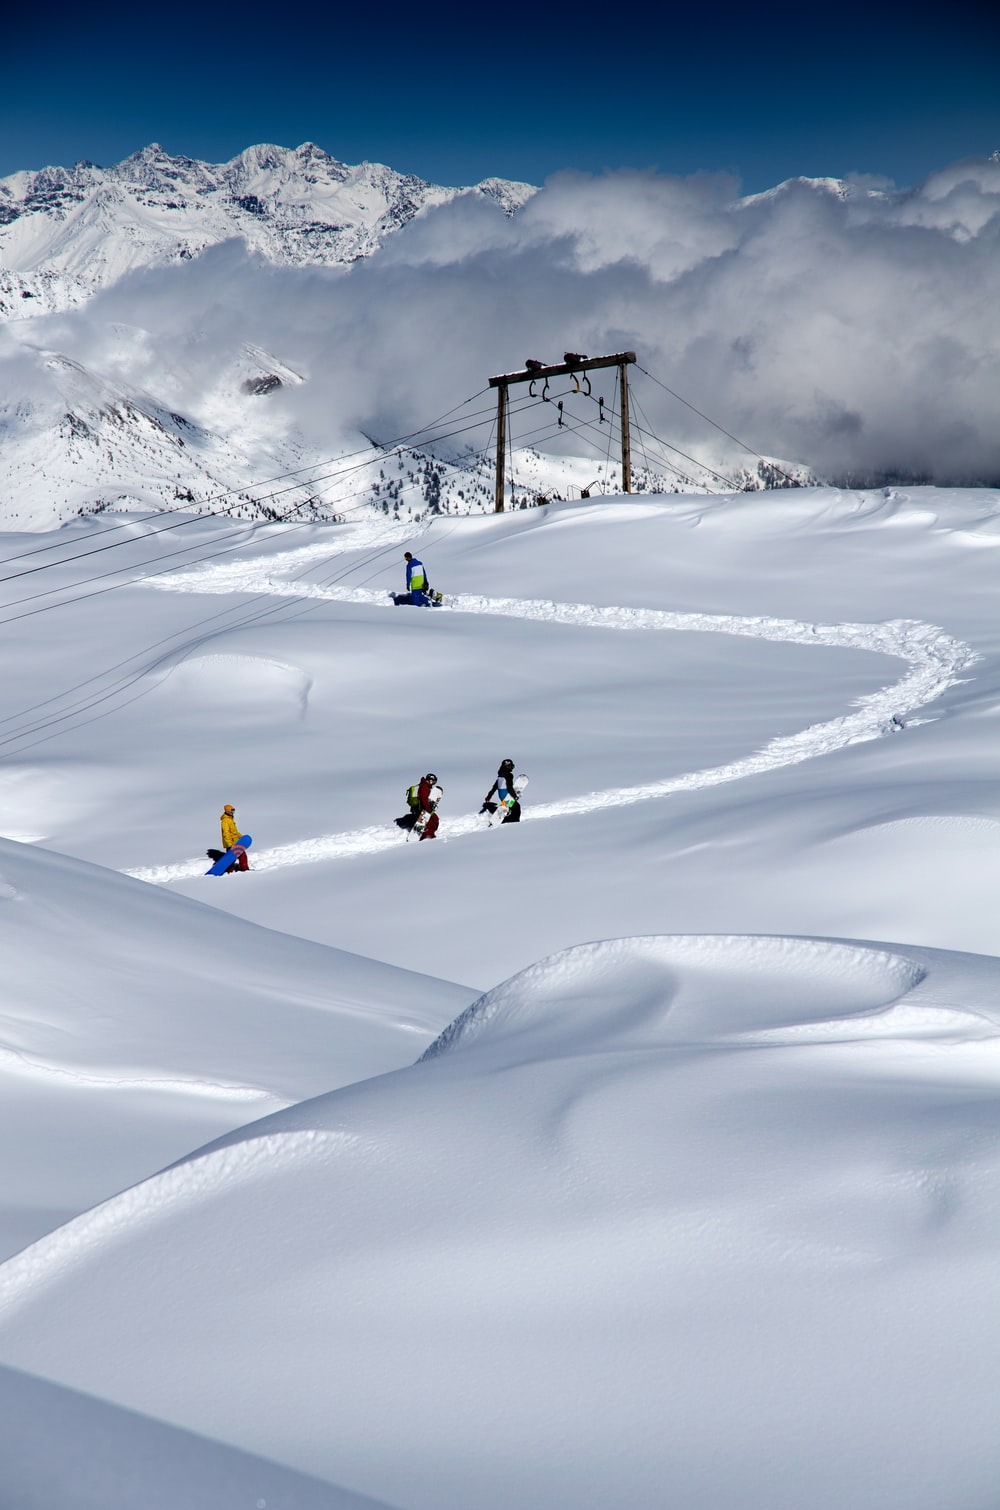 snowy field photograph